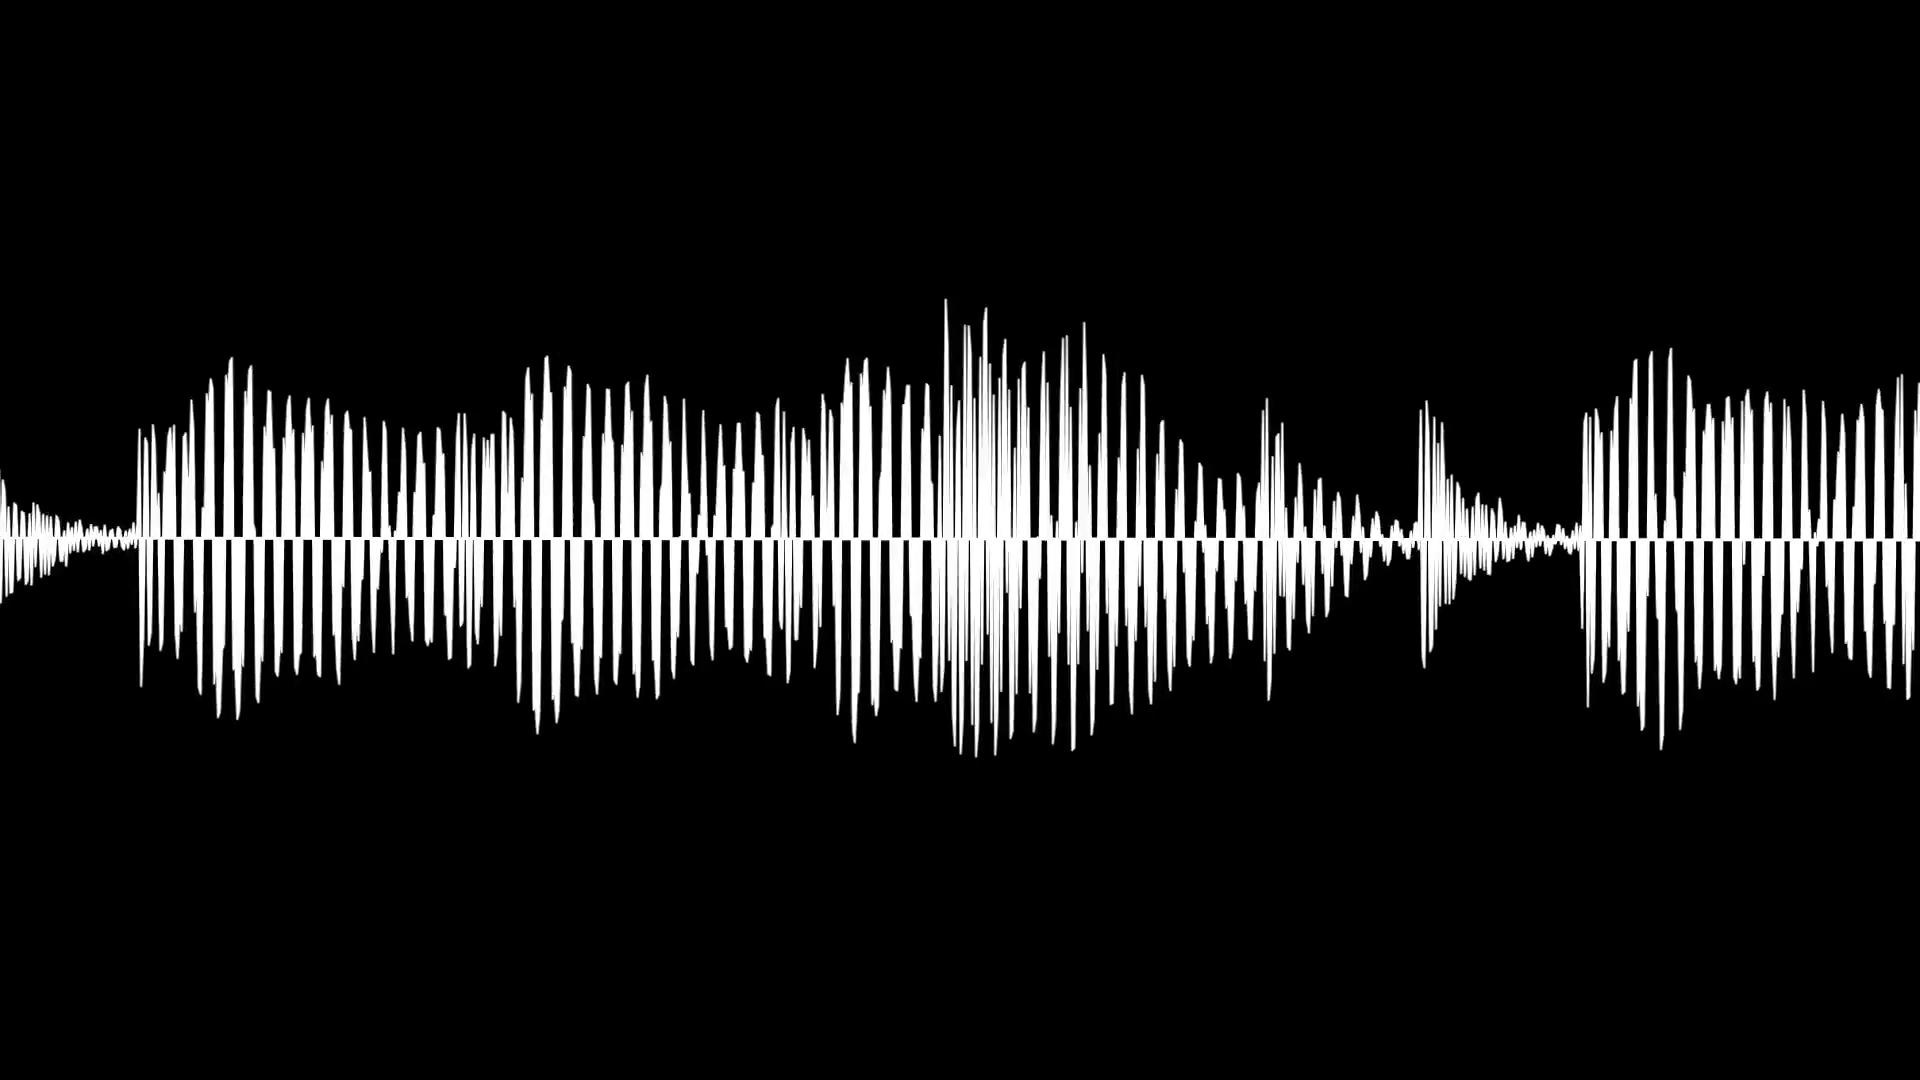 Audio waveform animation, simple black and white sound